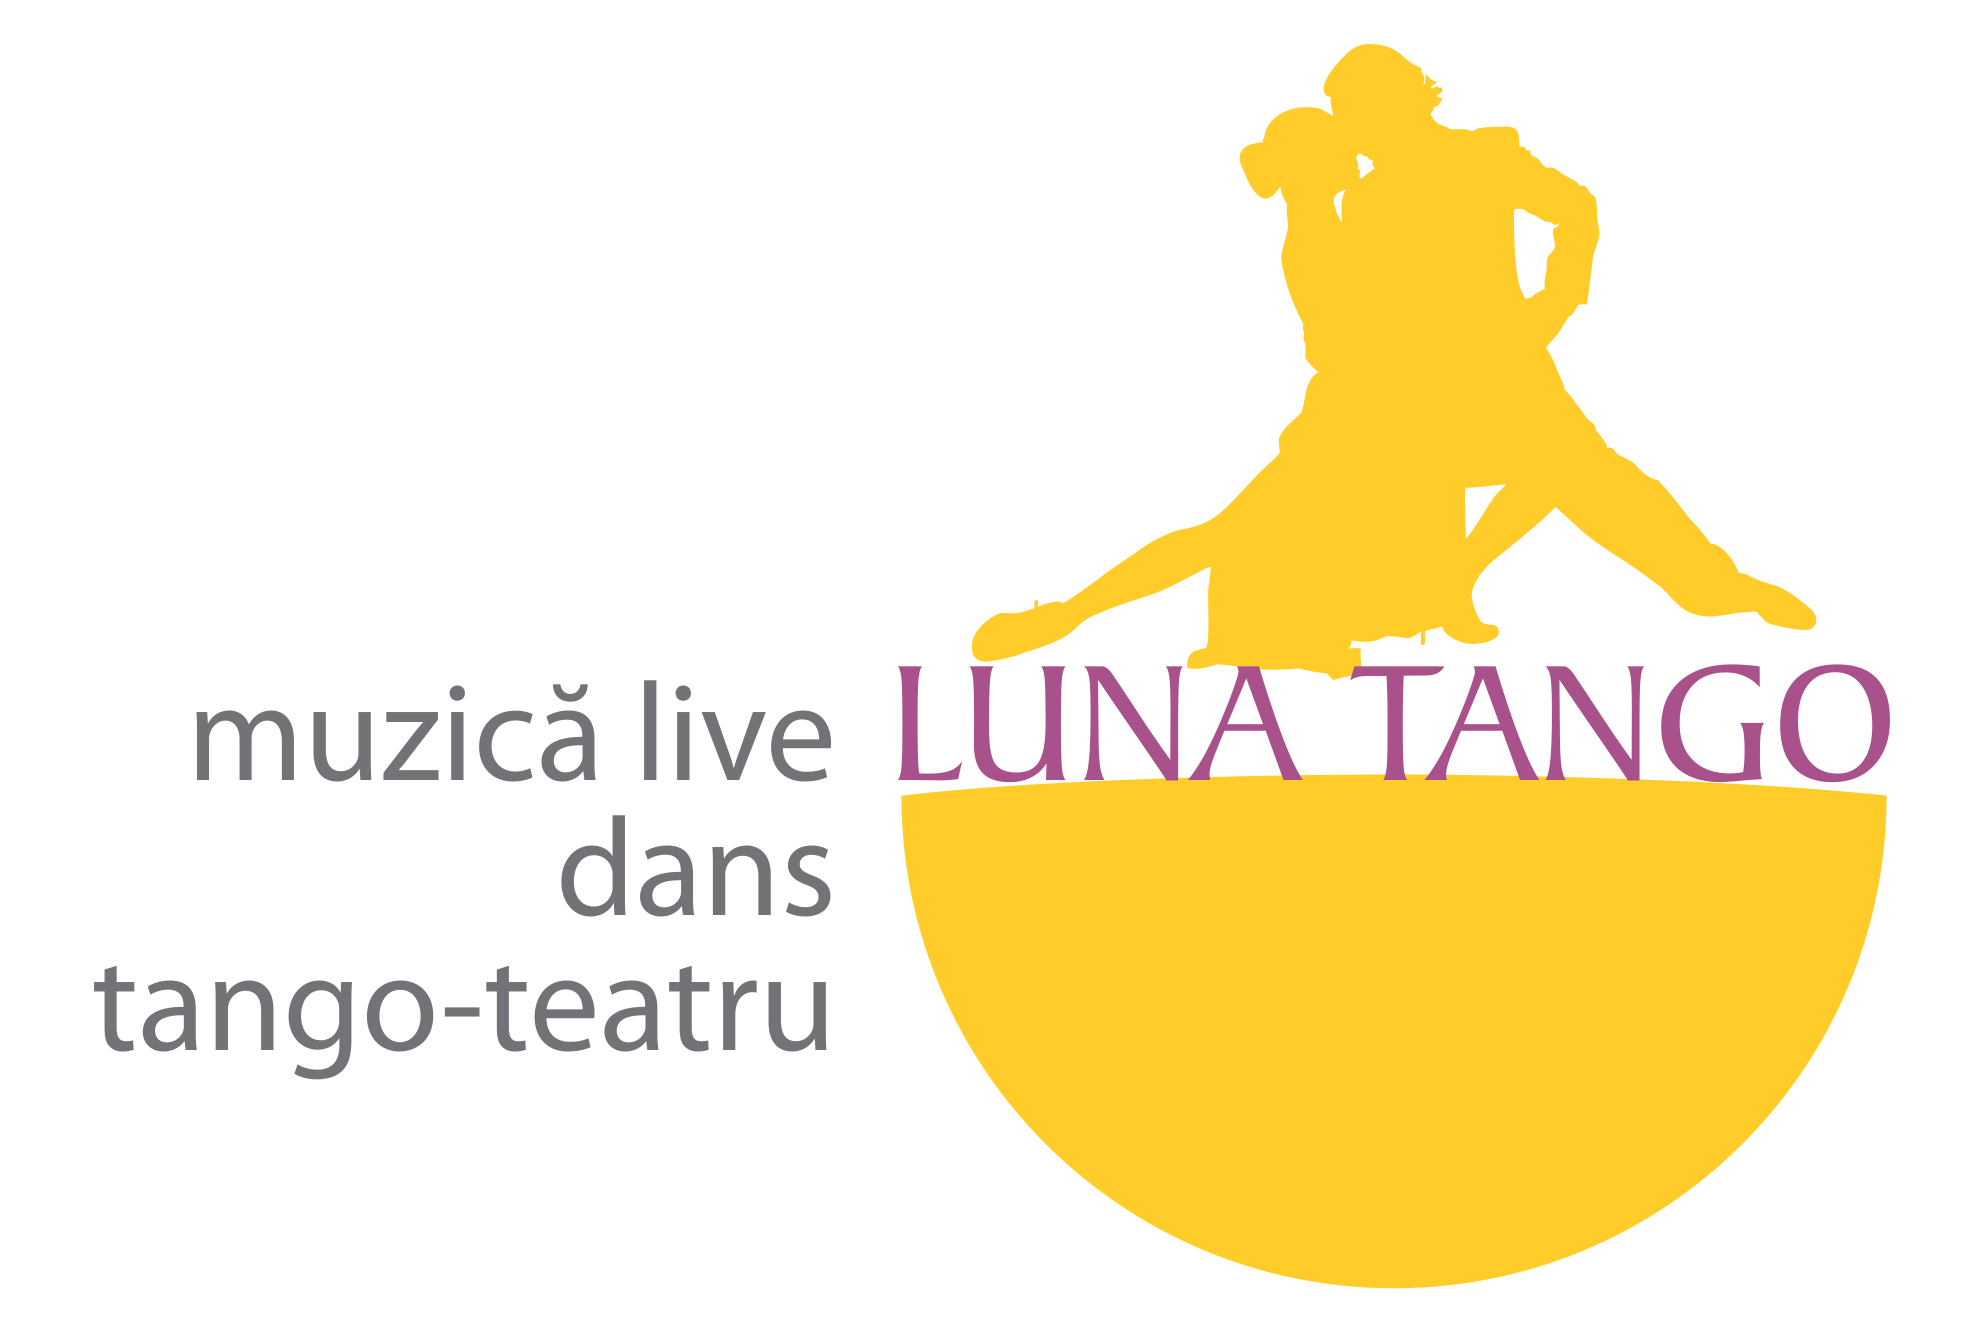 2015_07_30_Logo Luna tango_color